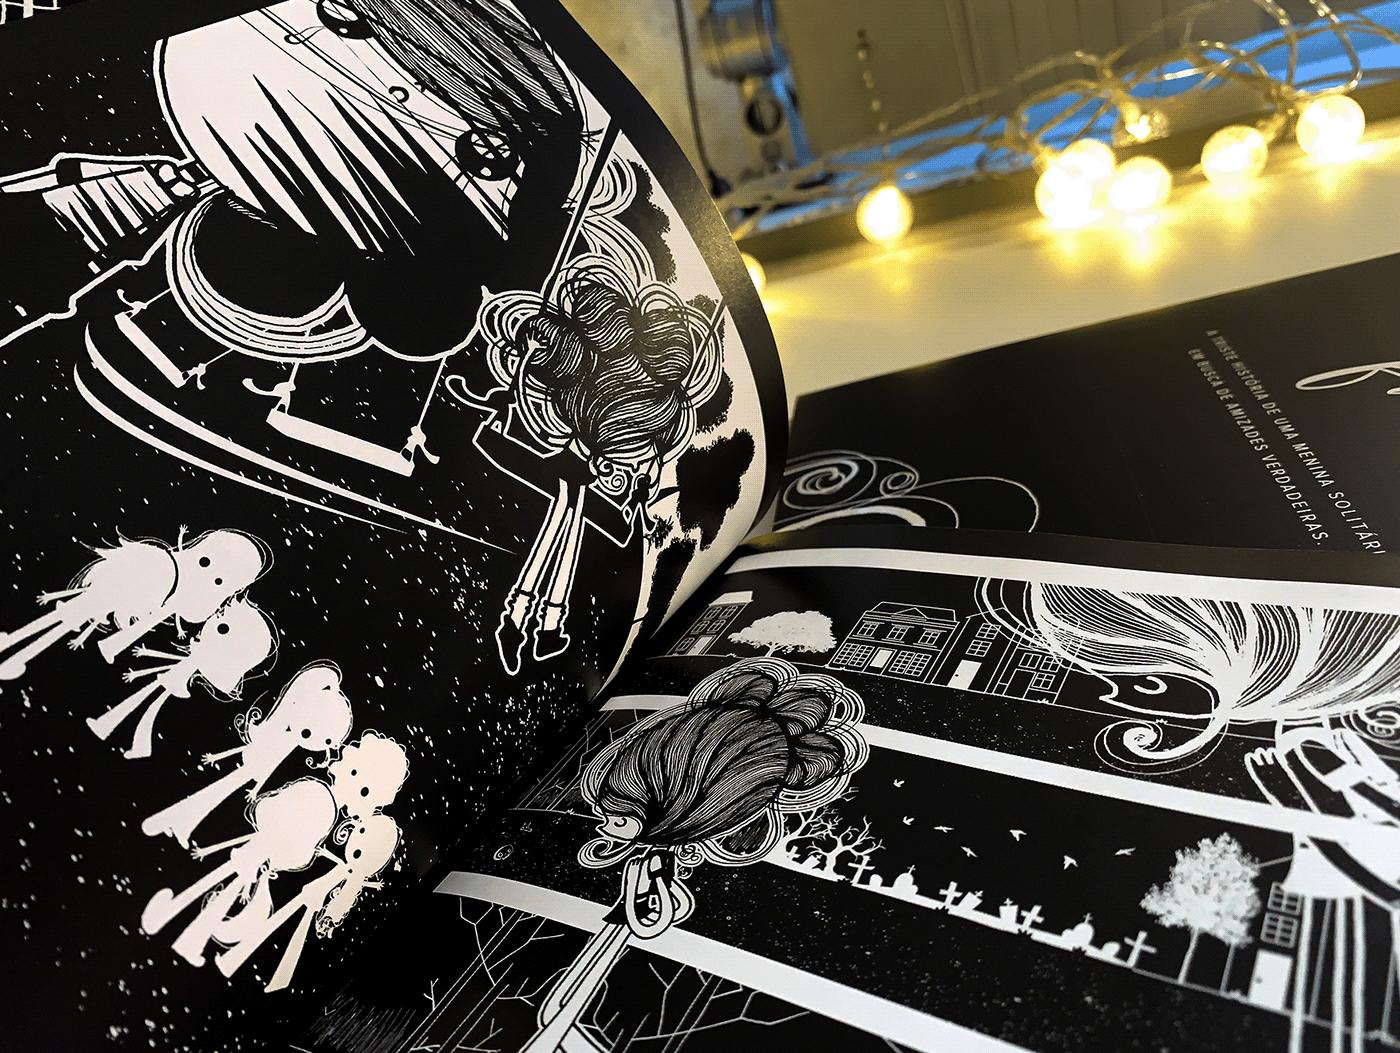 Comic Book História em Quadrinhos horror horror history hq ILLUSTRATION  inktober quadrinhos Terror